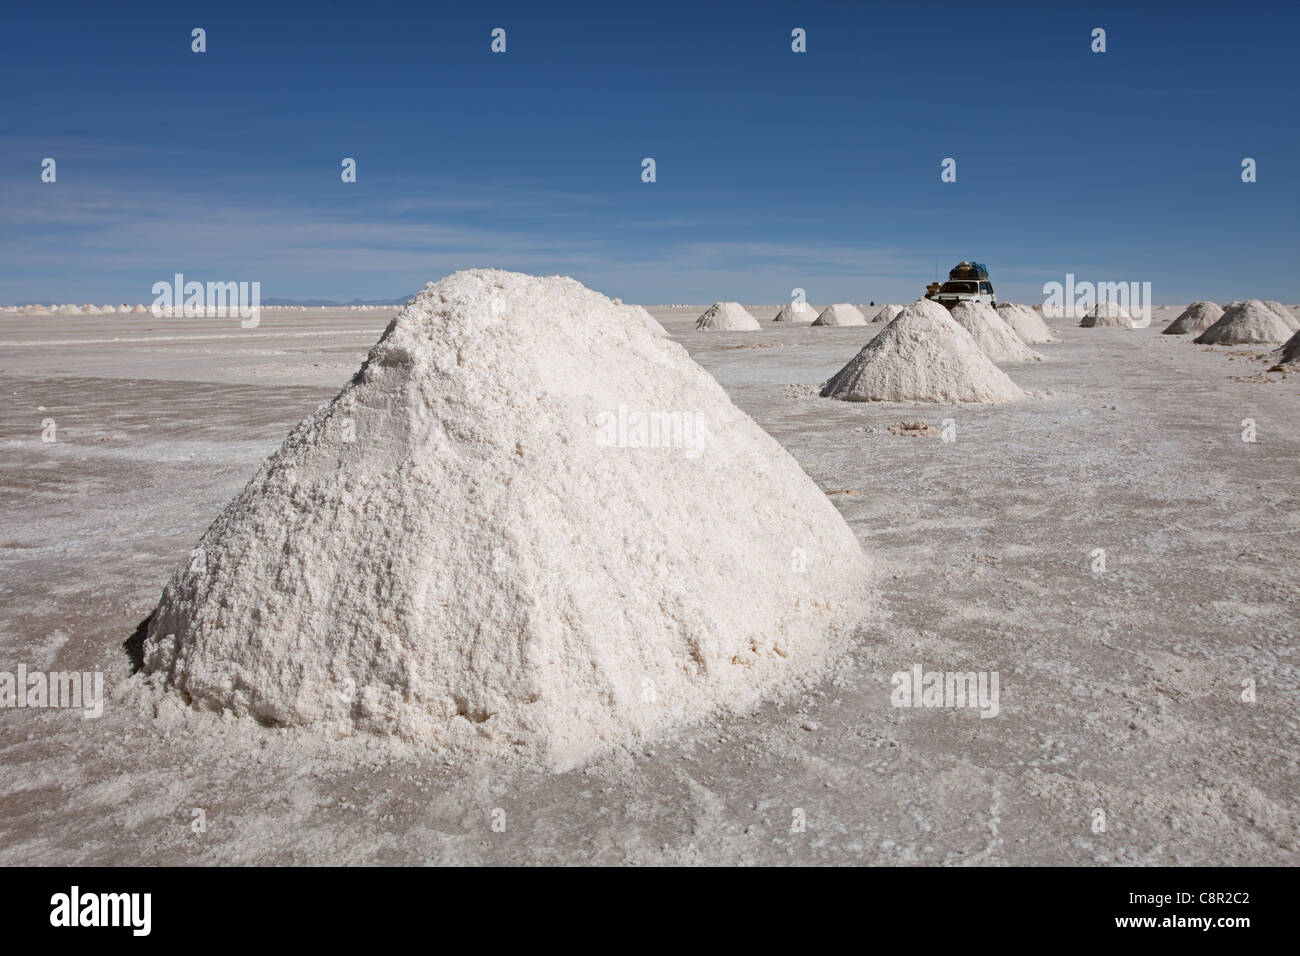 Salar de Uyuni: Salt Production - Stock Image